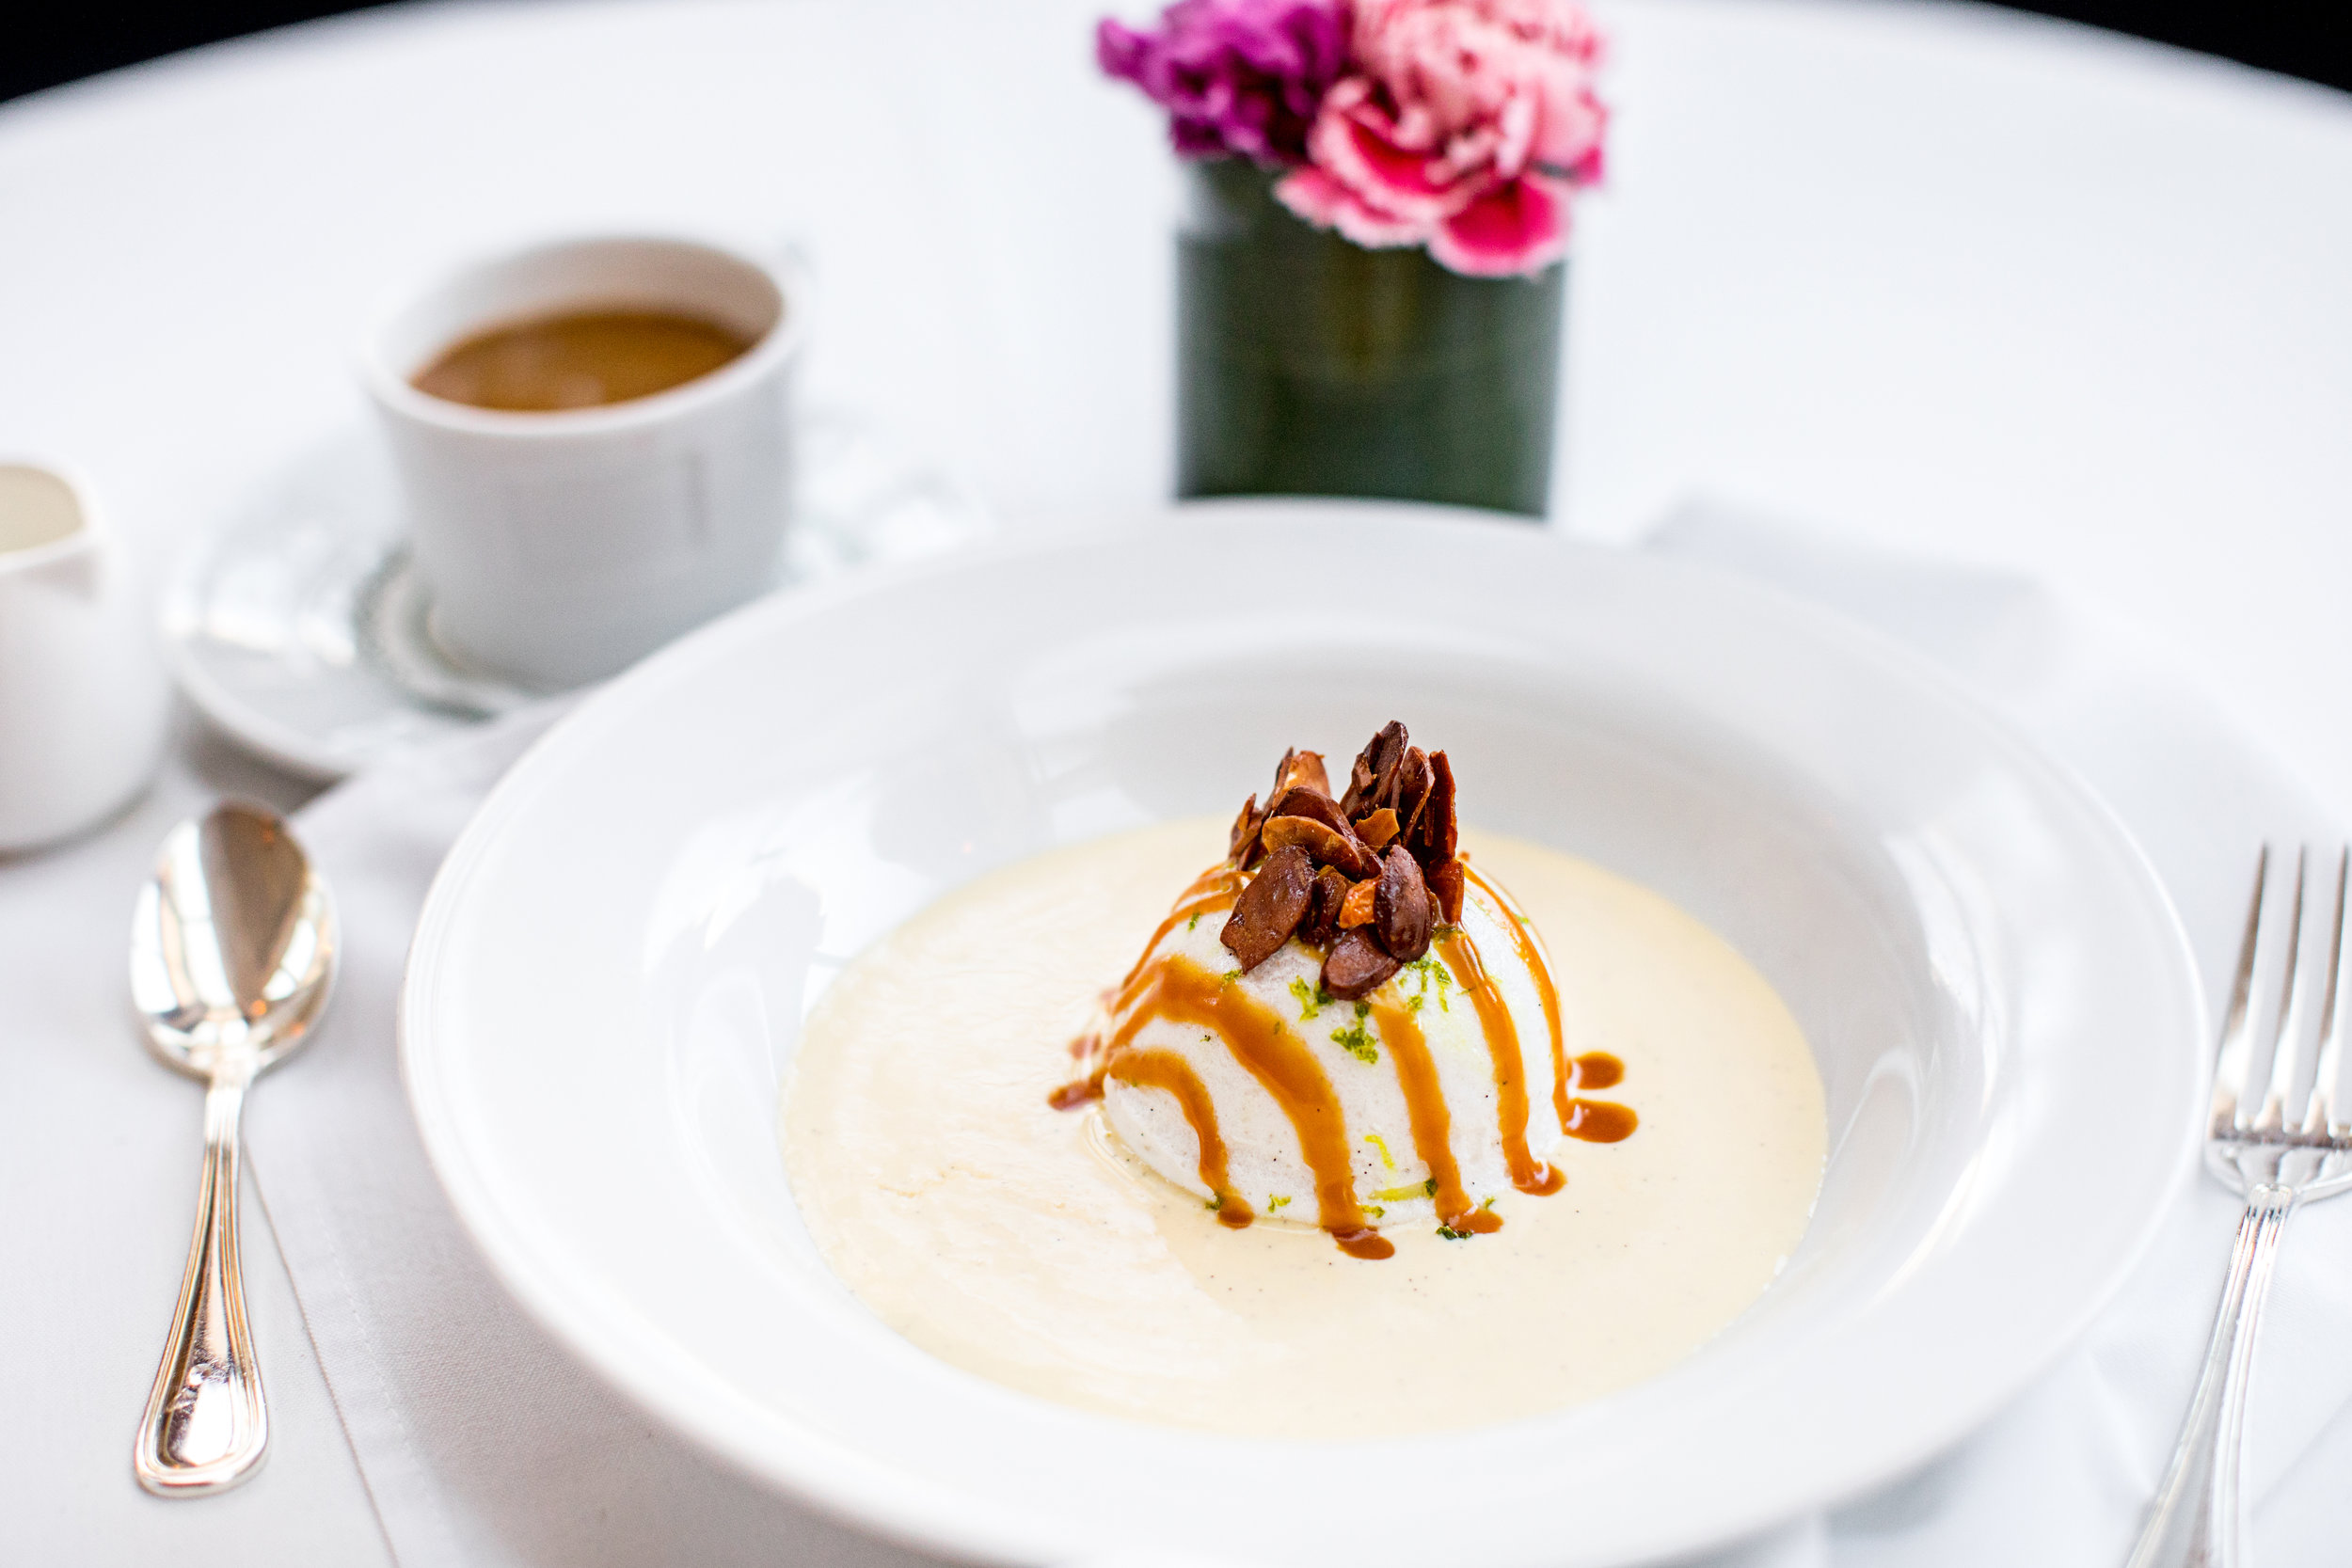 Rainer Shaw Le Bilboquet Fourteen Hours CityBox Media Hottest Restaurants Dessert.jpg